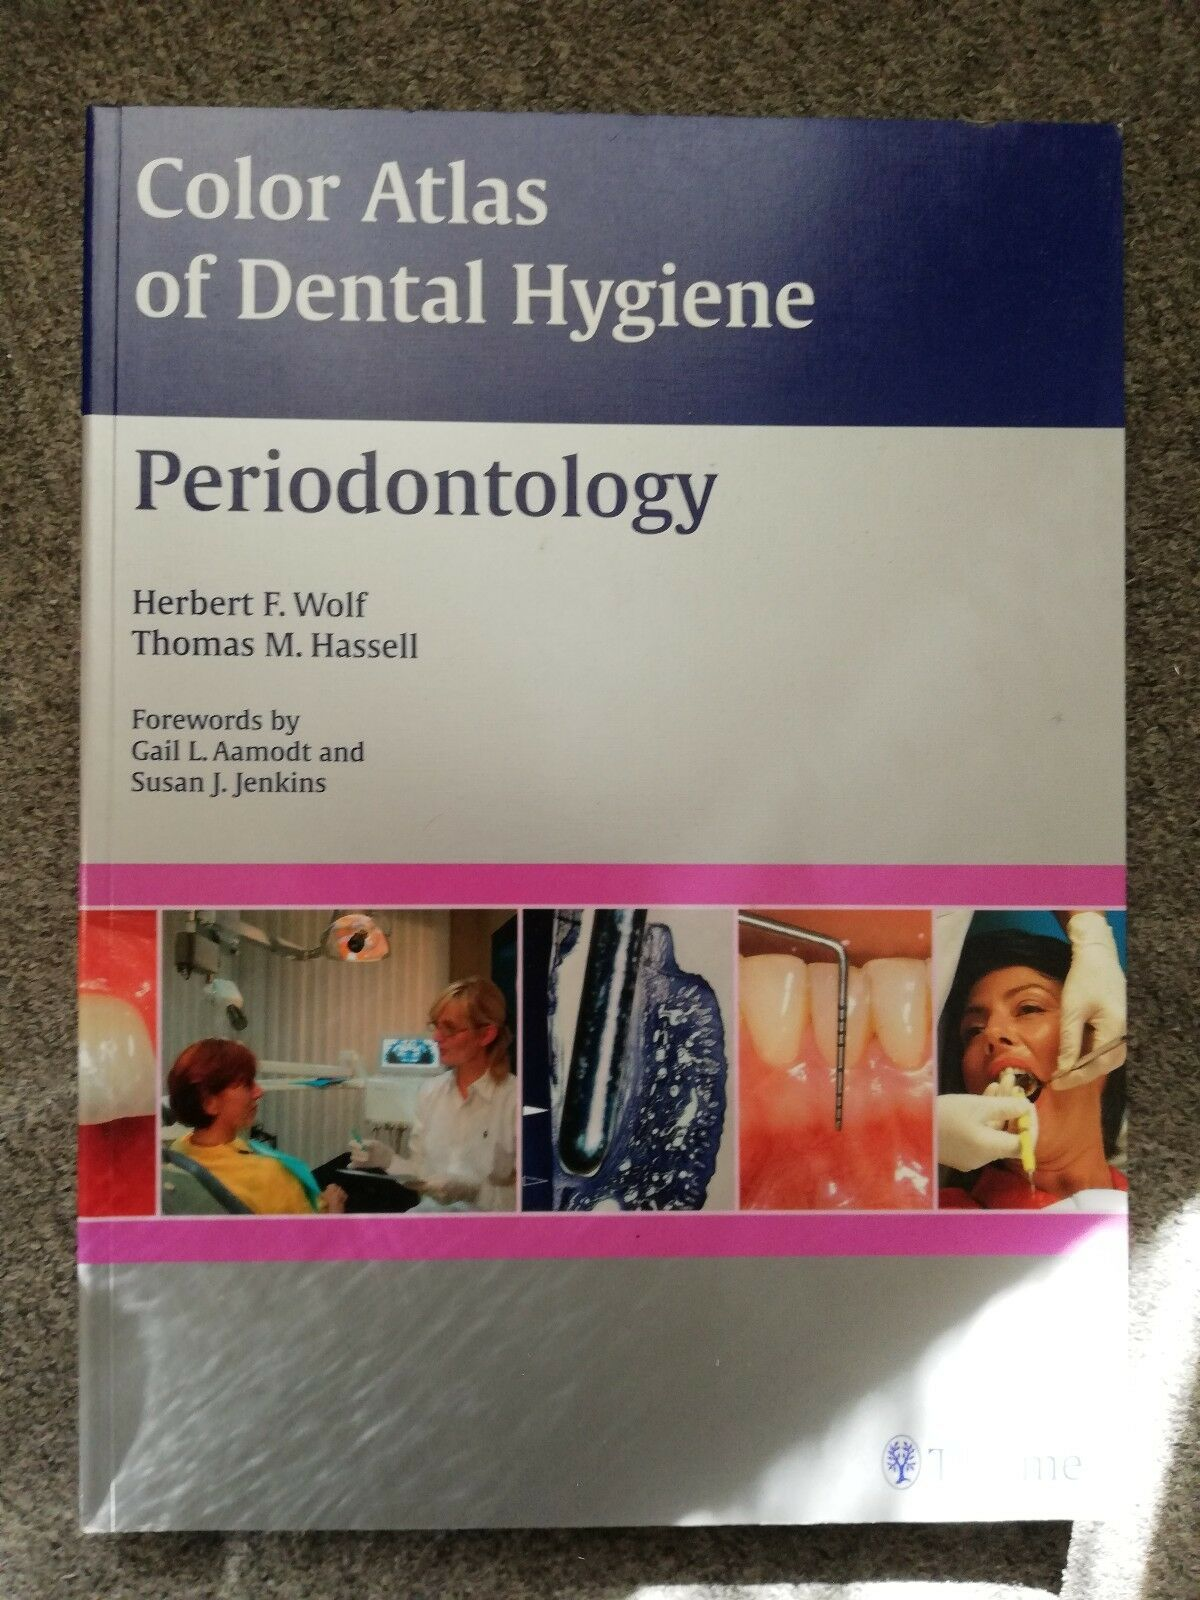 Color Atlas of Dental Hygiene / Periodontology / KOMPLETT NEU! TOP!